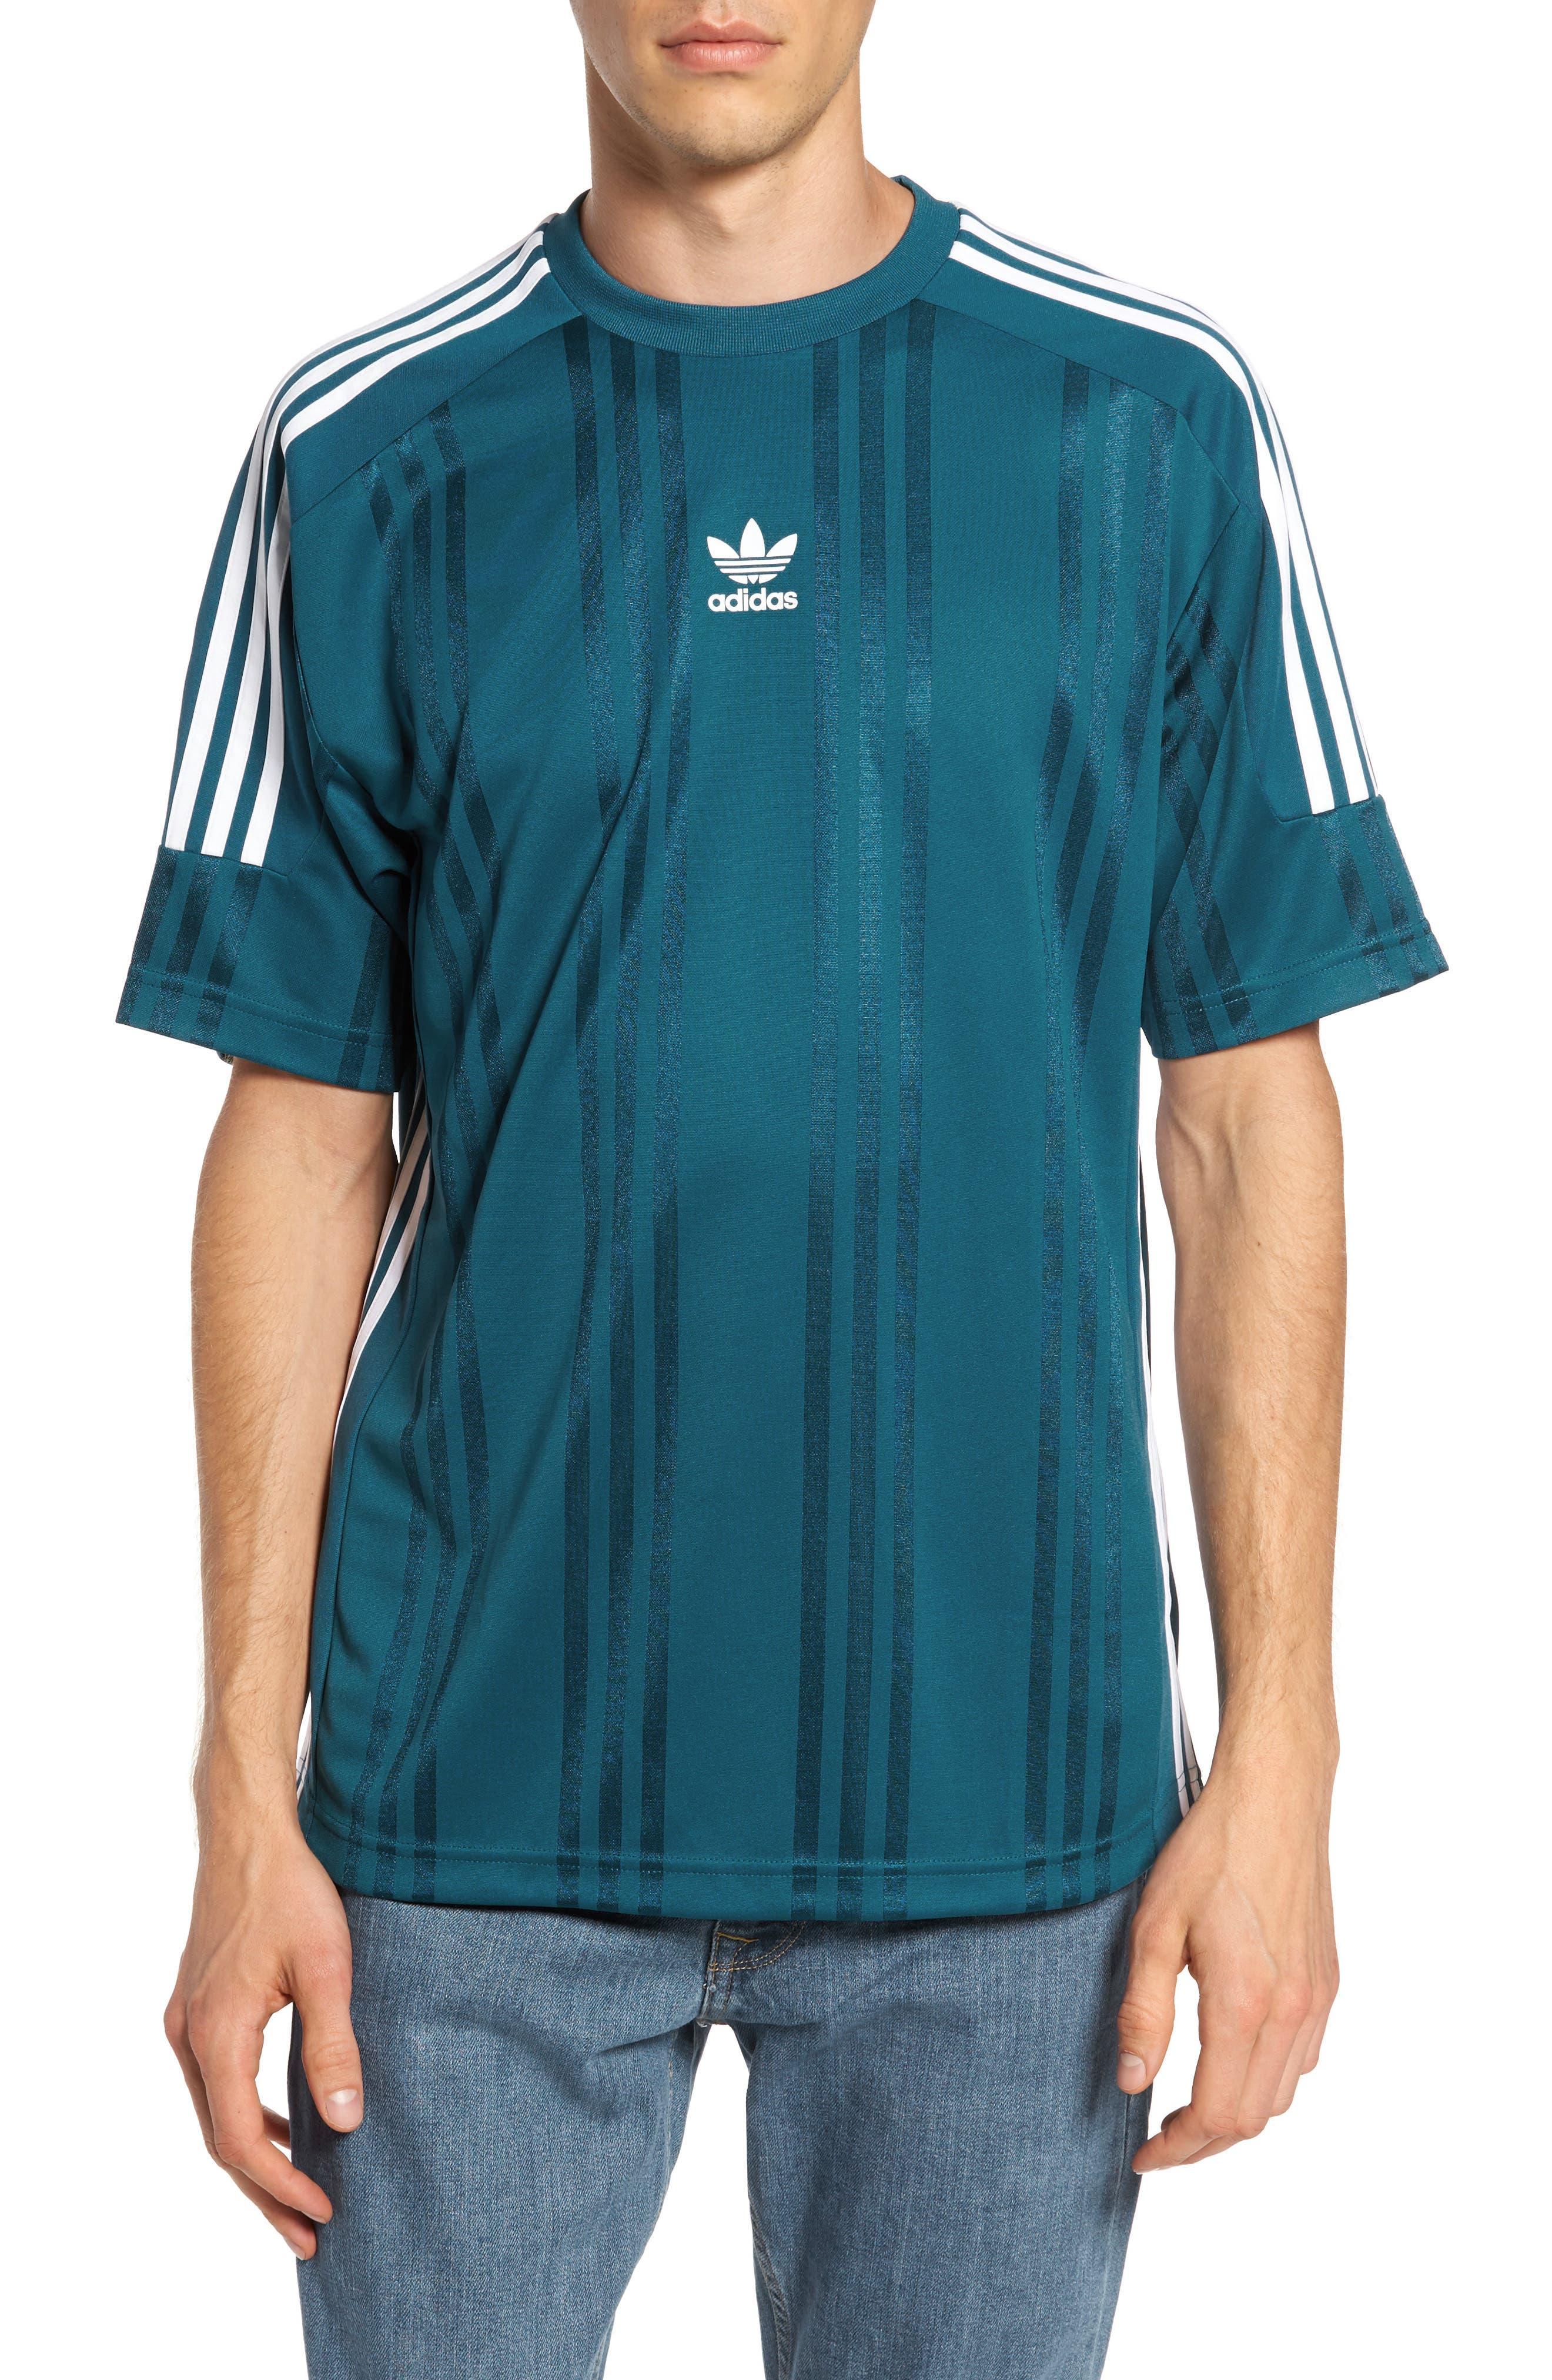 Originals Jacquard Stripe T-Shirt,                             Main thumbnail 1, color,                             Real Teal